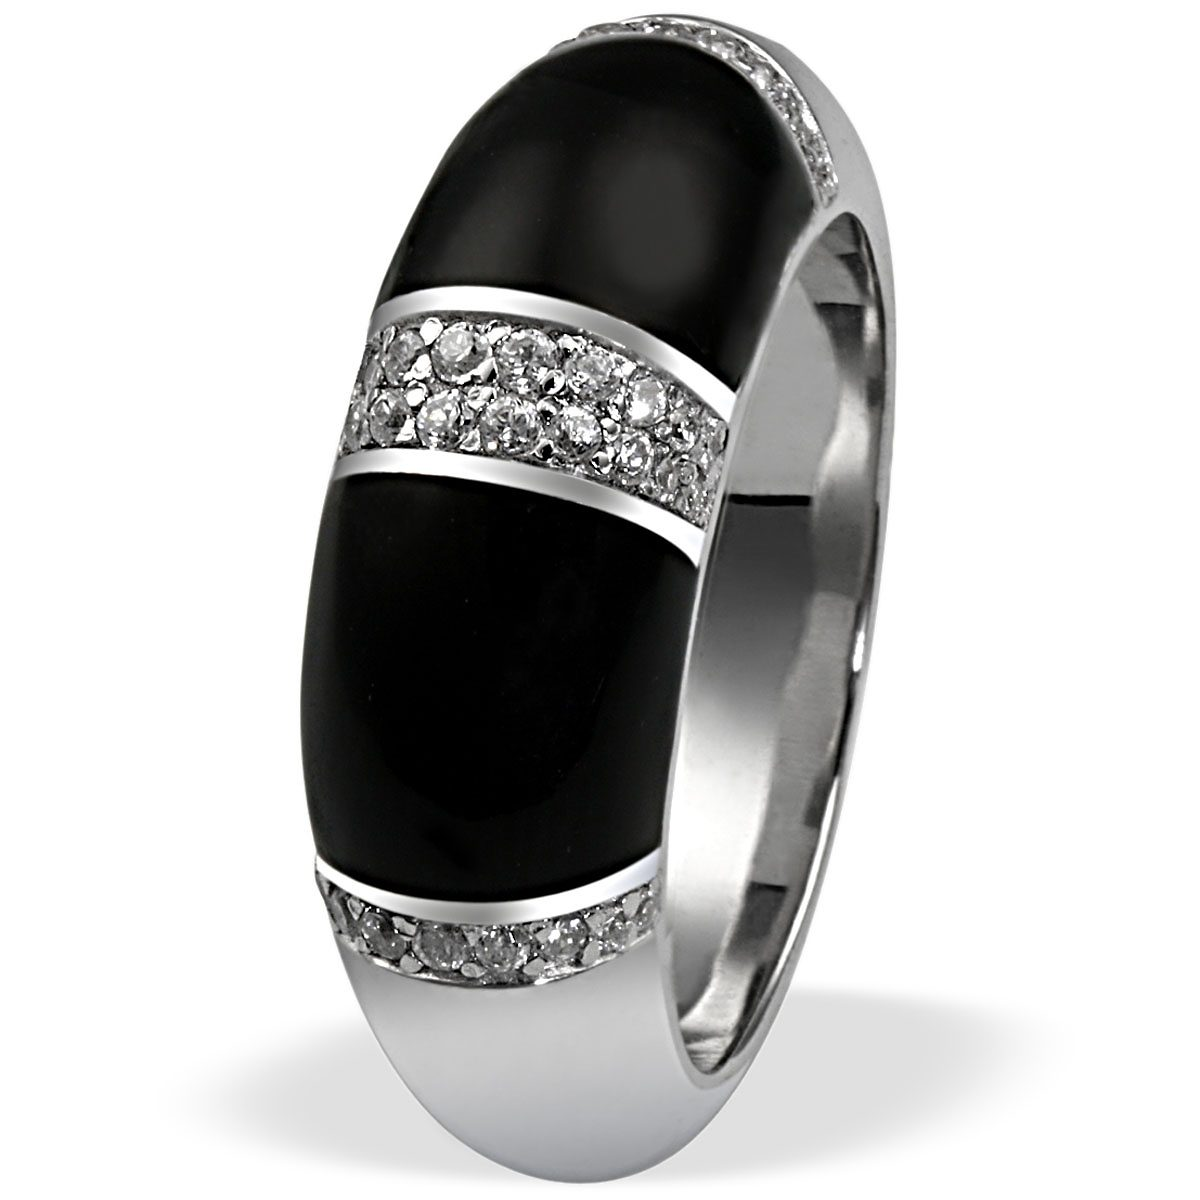 Averdin Damenring Silber 925/- Zirkonia schwarze Flächen massiv